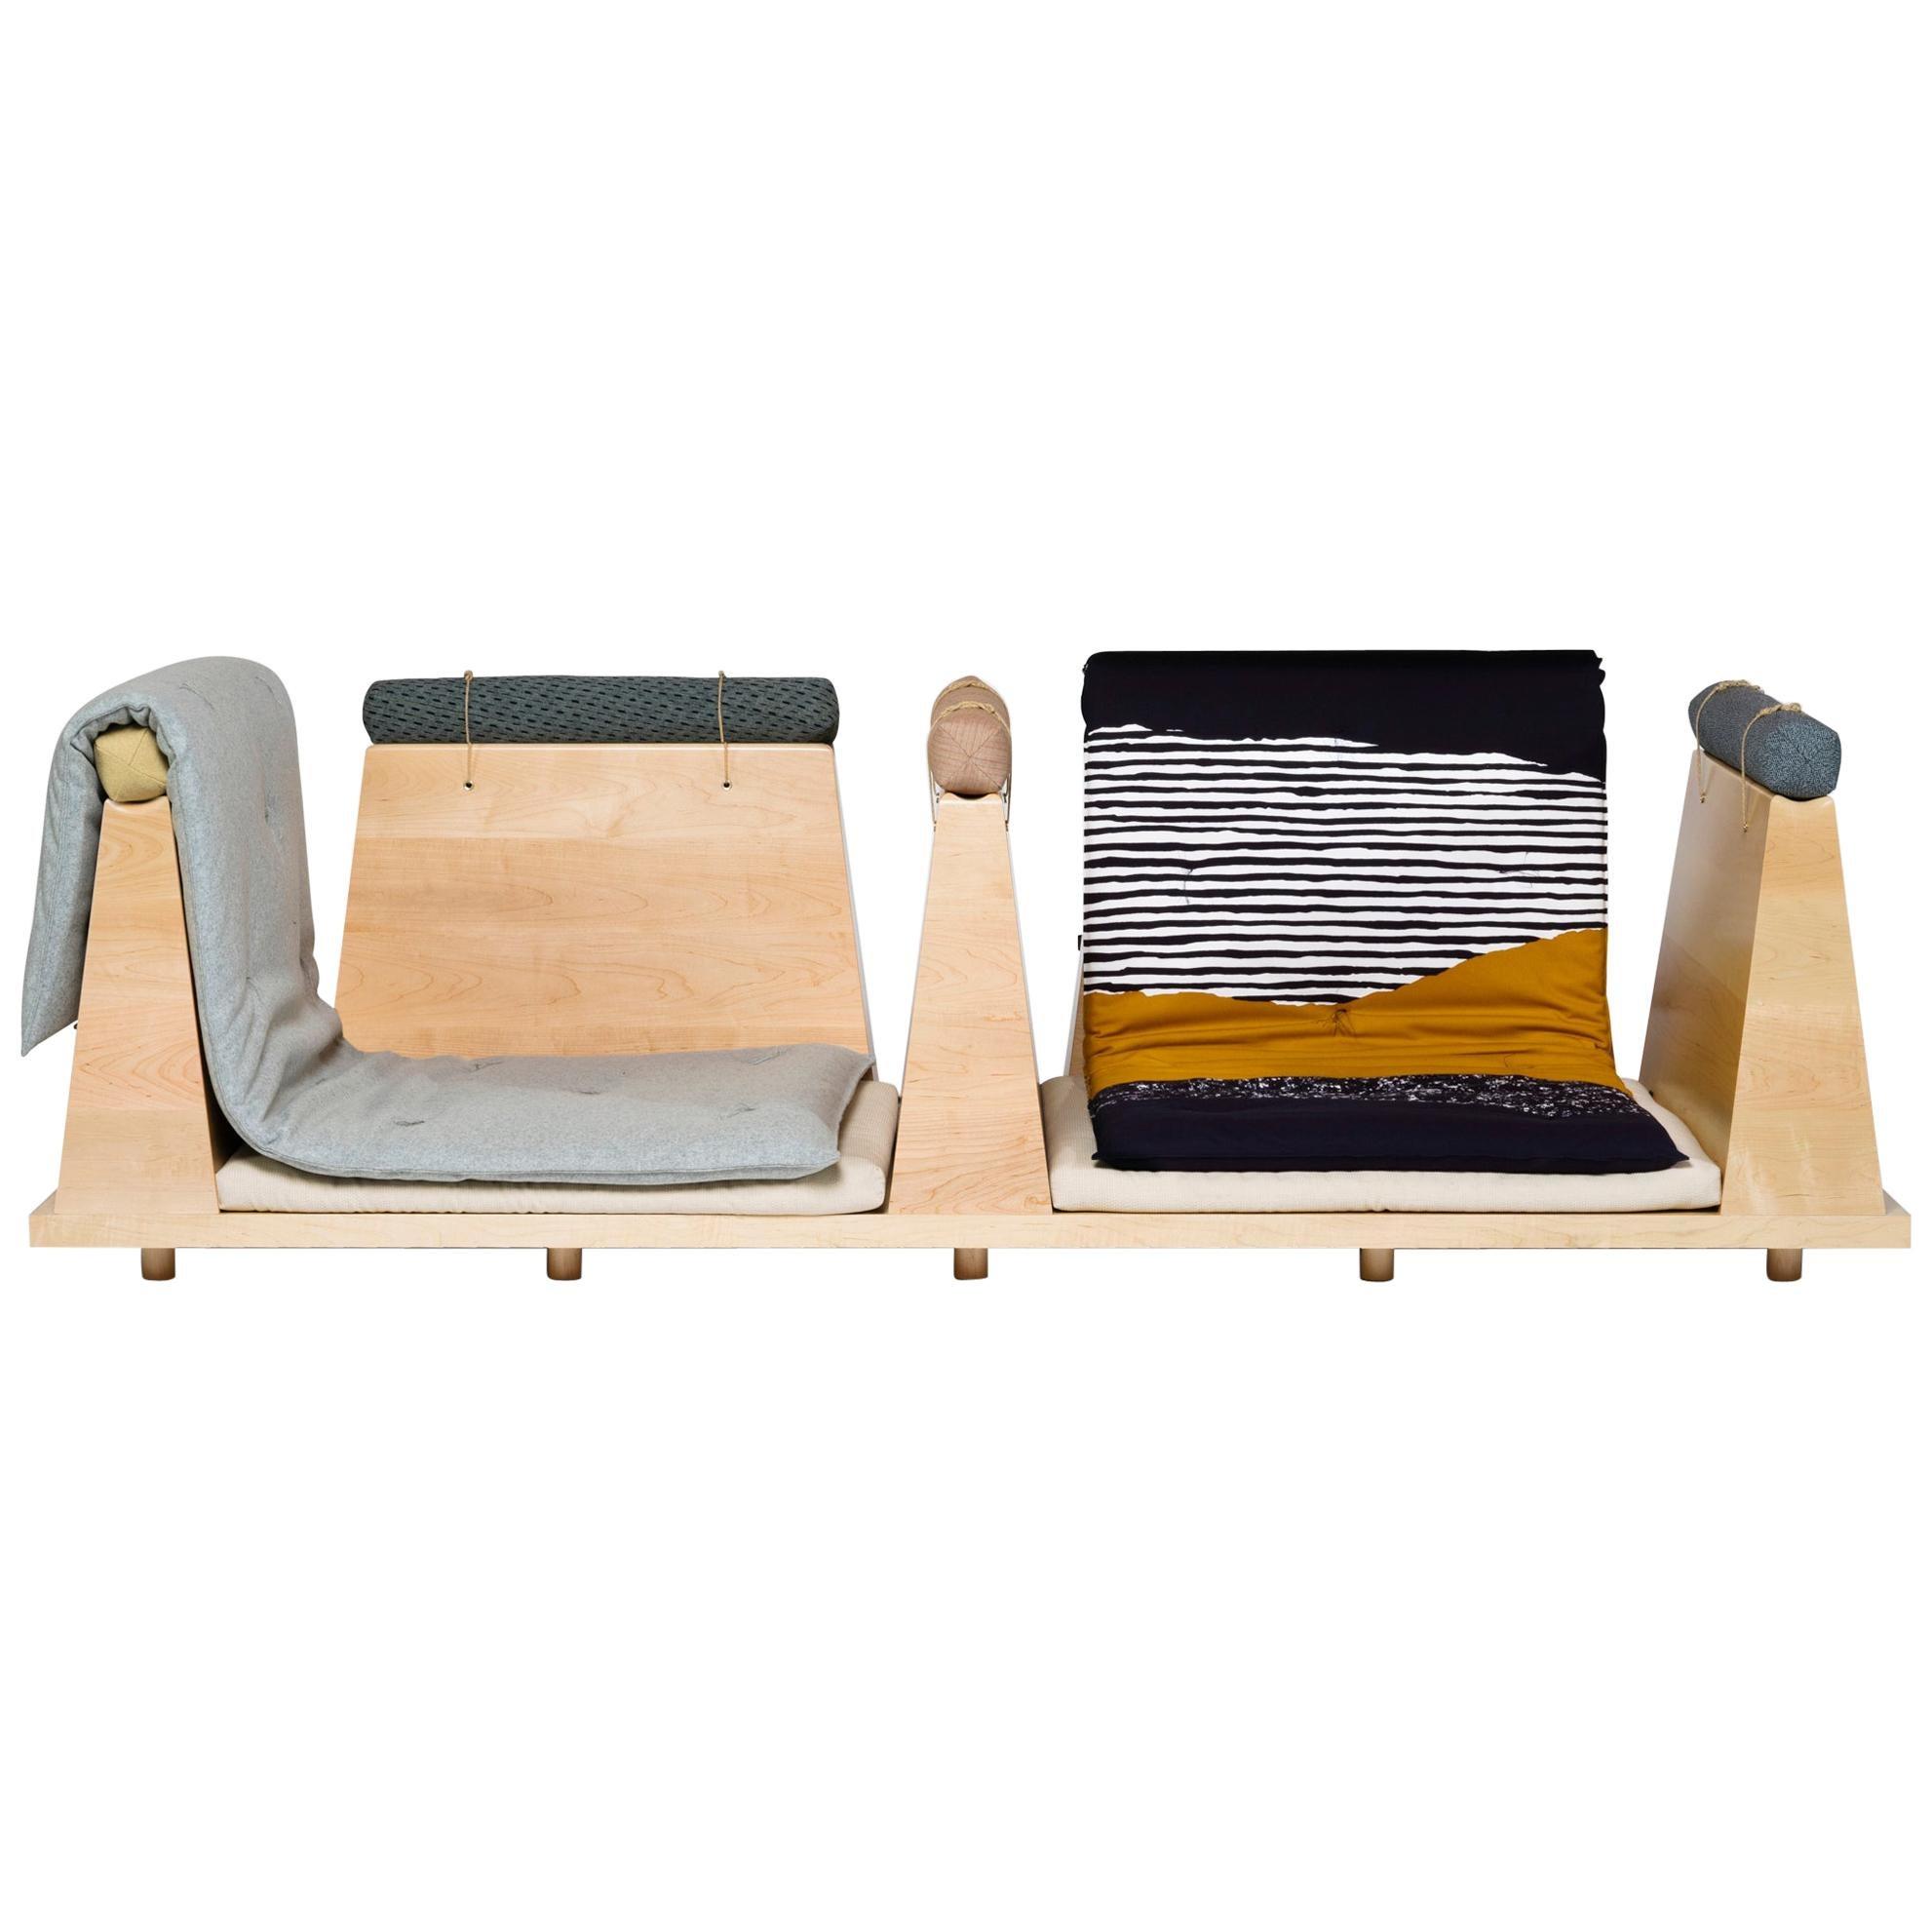 Zabuton Sofa, Handmade Japanese Futon on Modular Maple Frame